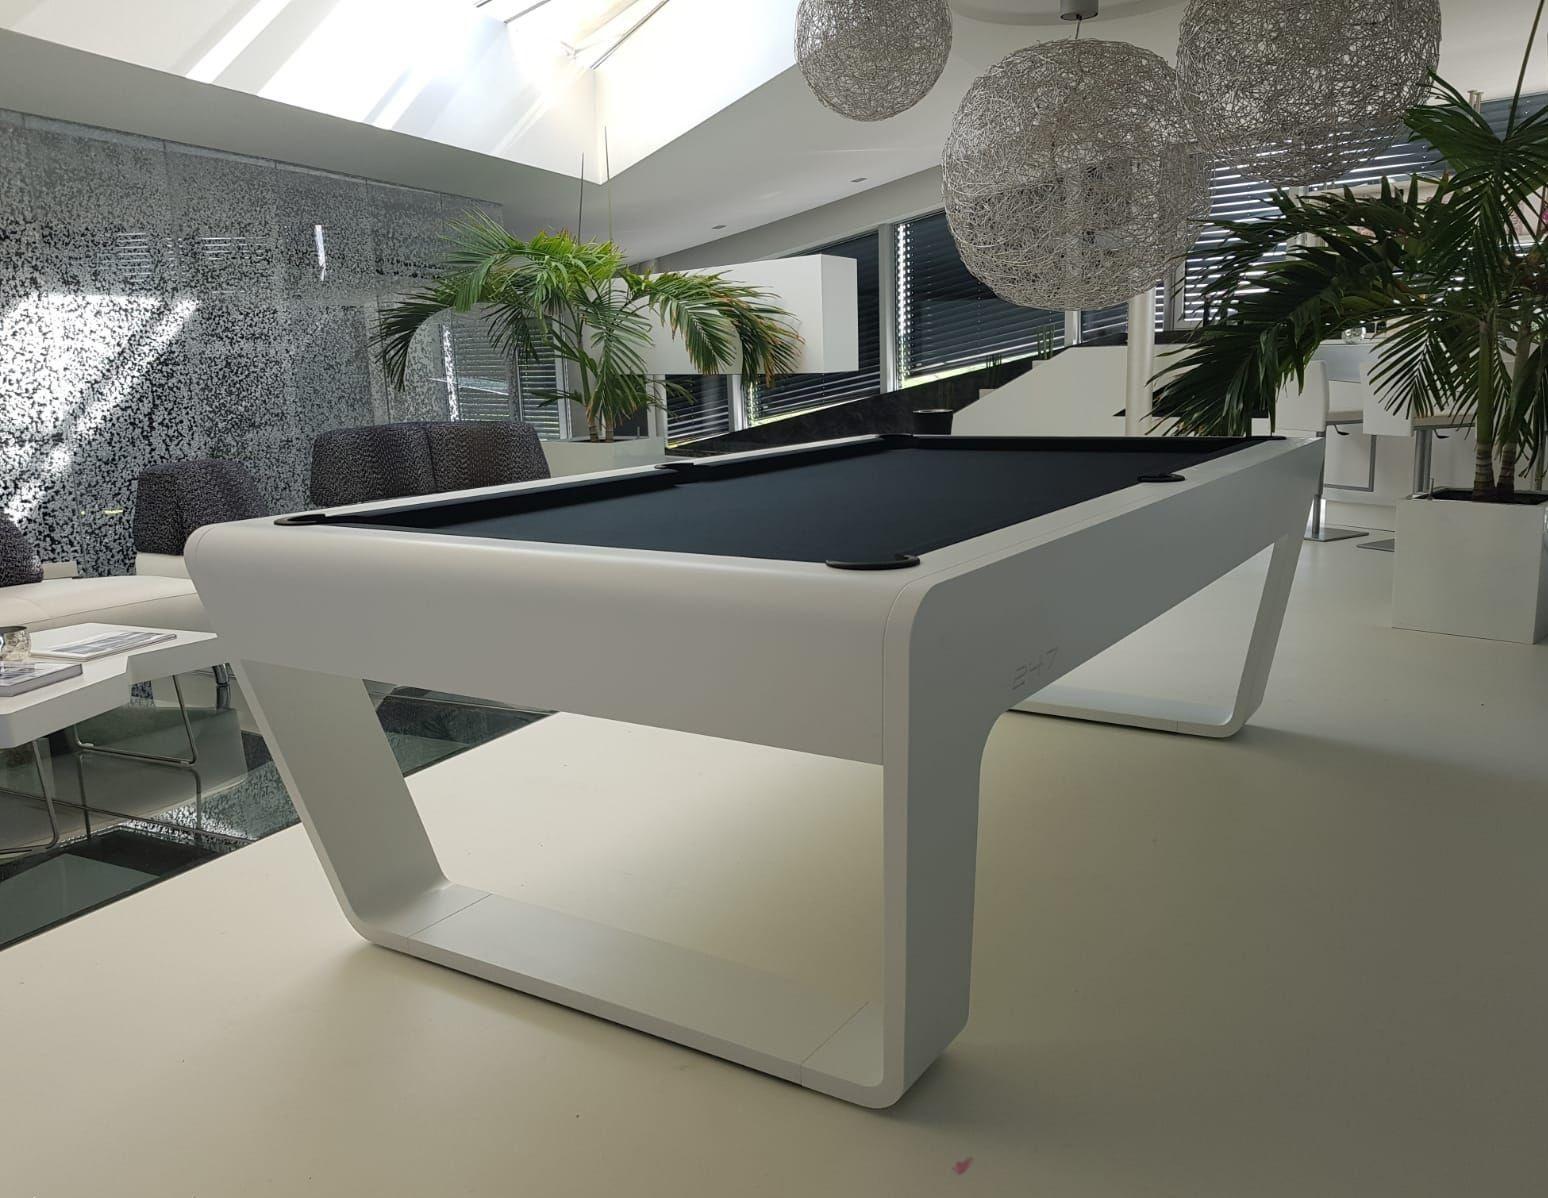 Bàn bida Porsche's 24/7 billiard table